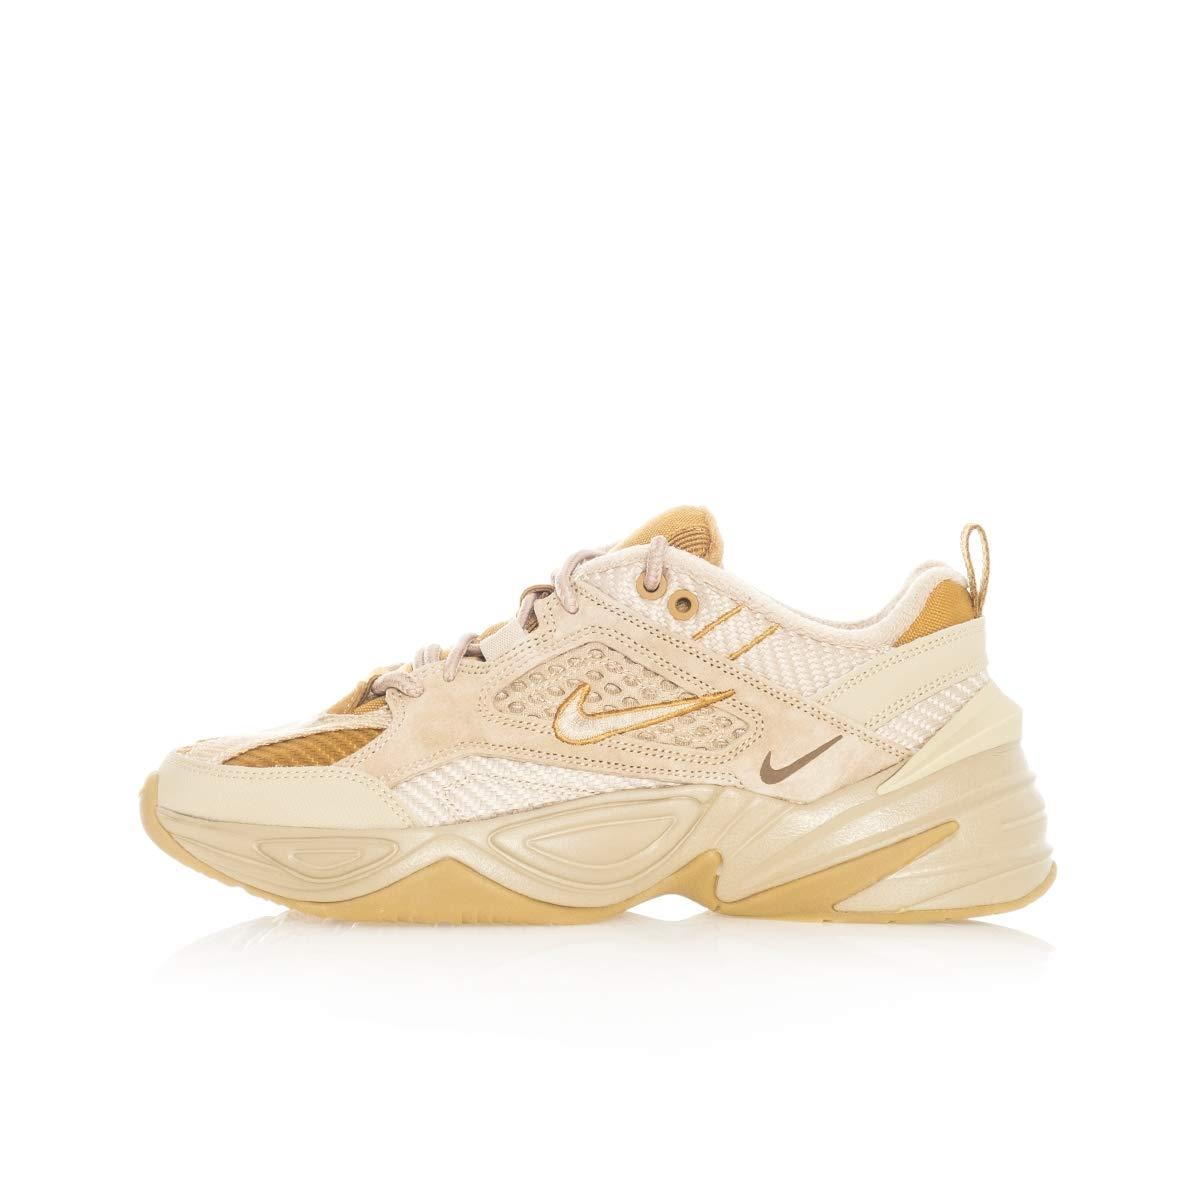 943443fd6 Amazon.com   Nike M2k Tekno Sp Mens Bv0074-200   Fashion Sneakers